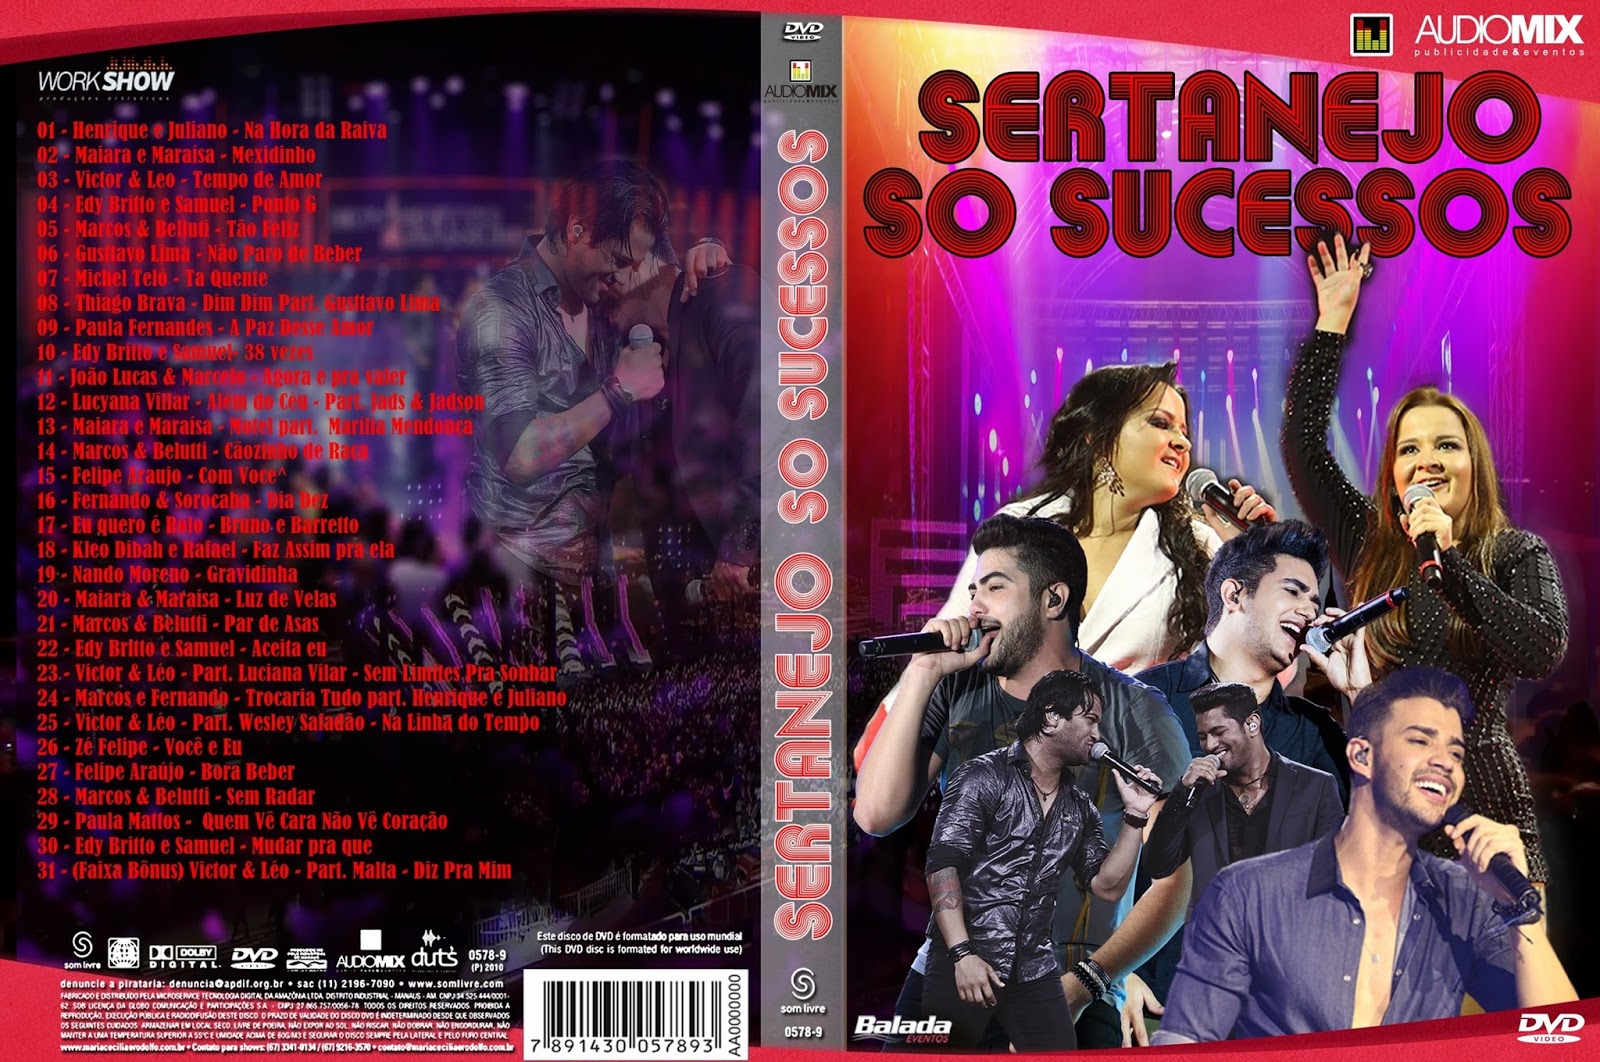 Download Sertanejo Só Sucessos DVD-R Sertanejo 2B 2BS 25C3 25B3 2BSucessos